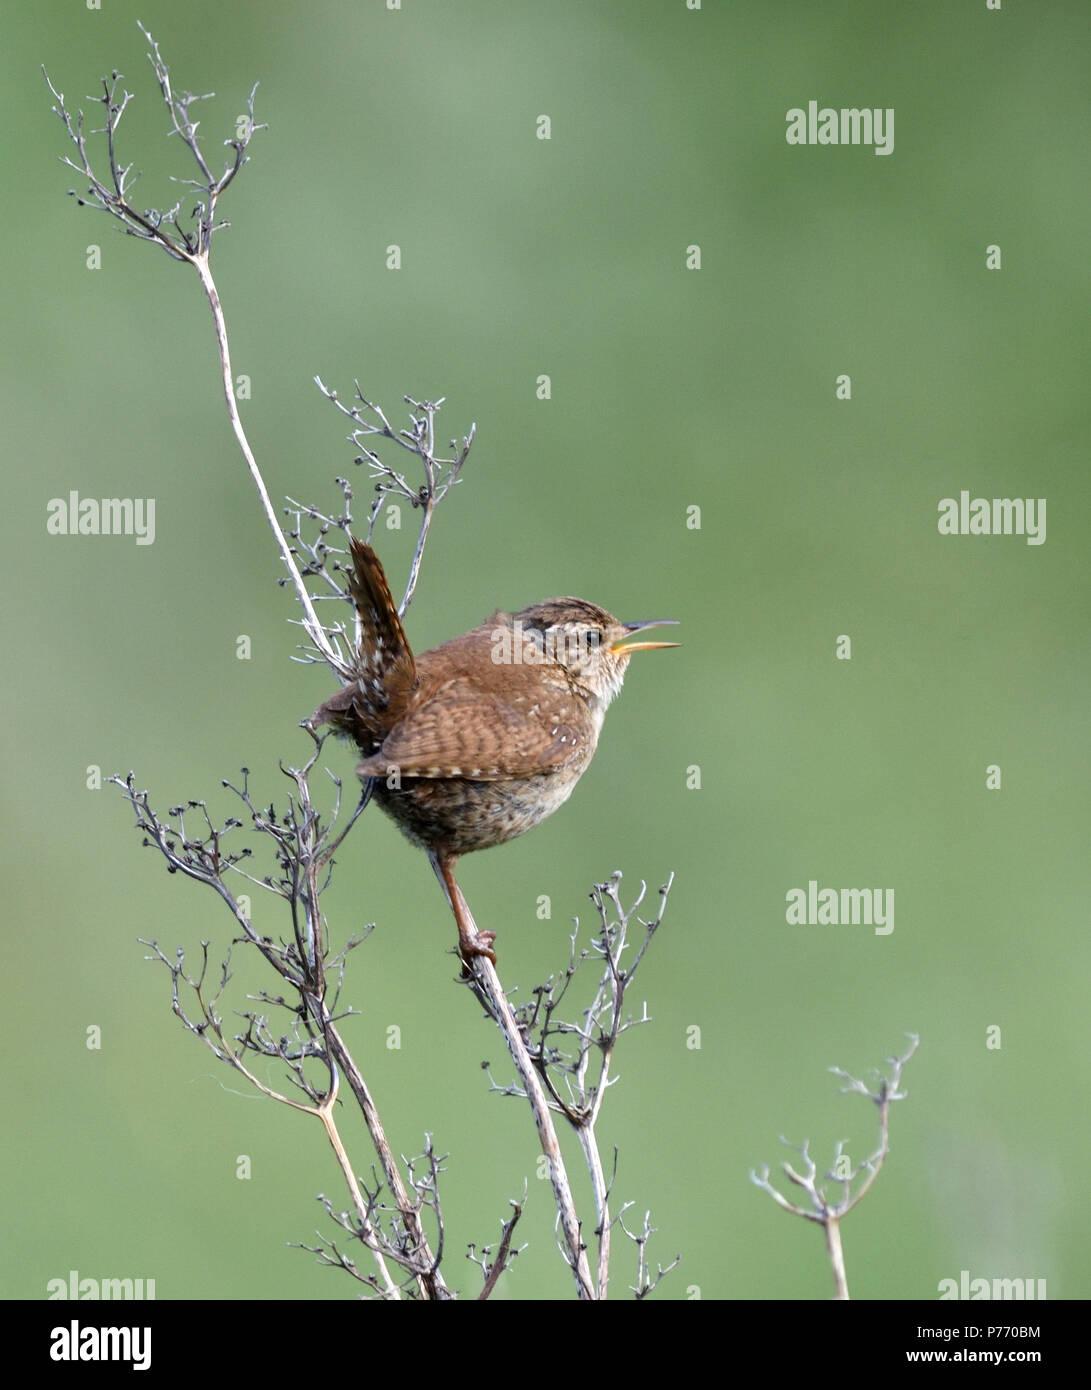 A wren (Troglodytes troglodytes) singing on dry plant stem. Ballycastle, Antrim, Northern Ireland. - Stock Image